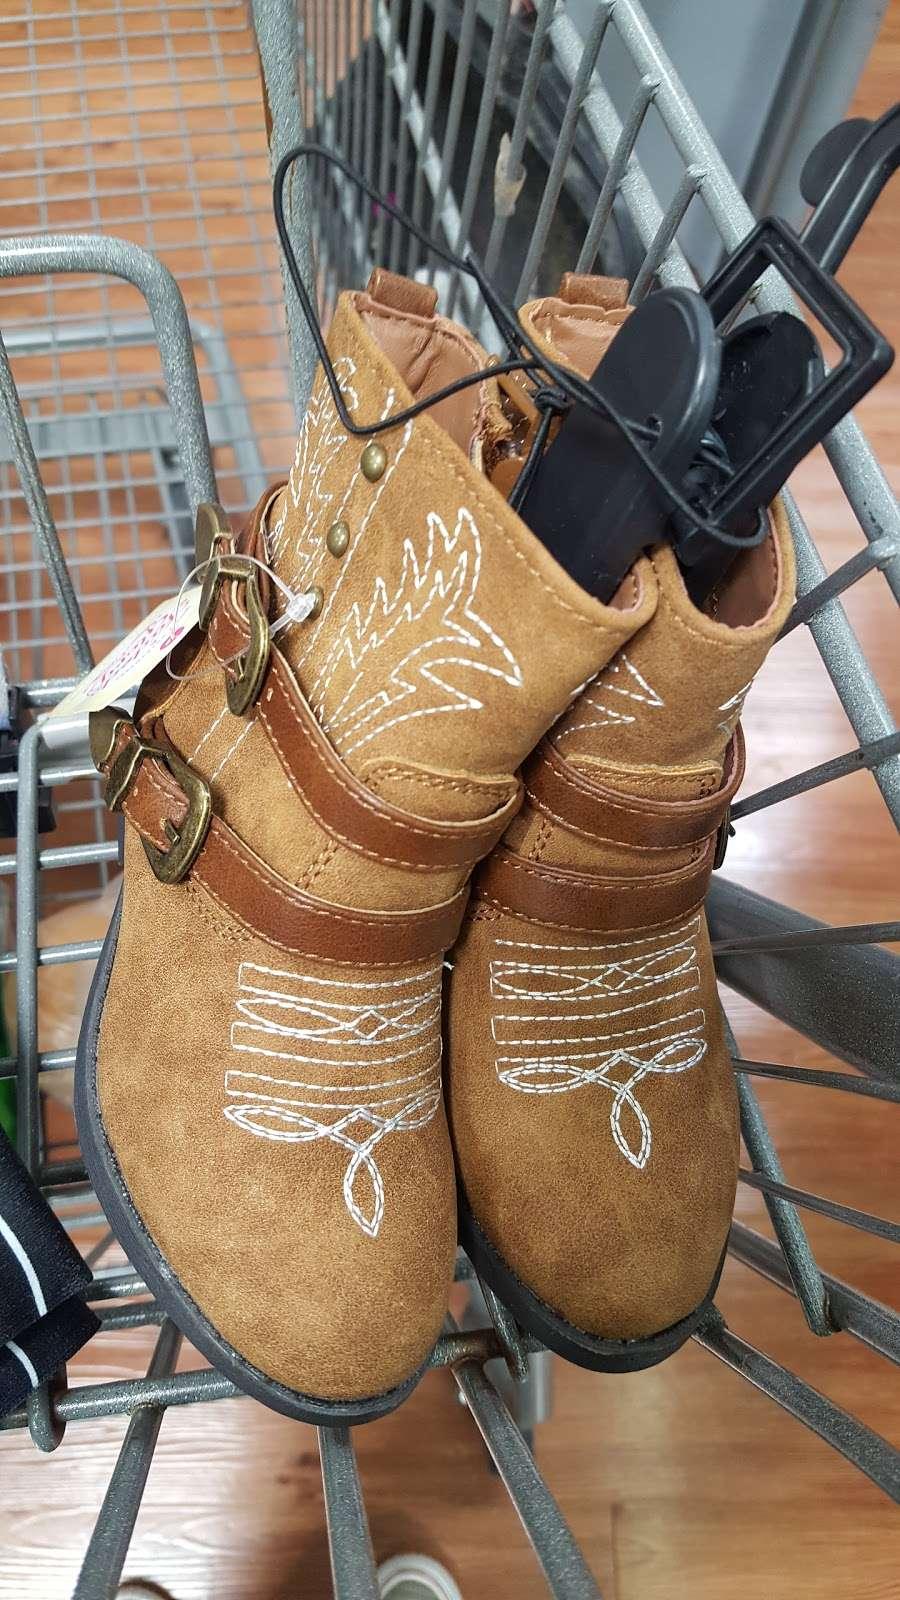 Walmart Supercenter - department store  | Photo 9 of 10 | Address: 115 W, FM 544, Murphy, TX 75094, USA | Phone: (972) 633-0257